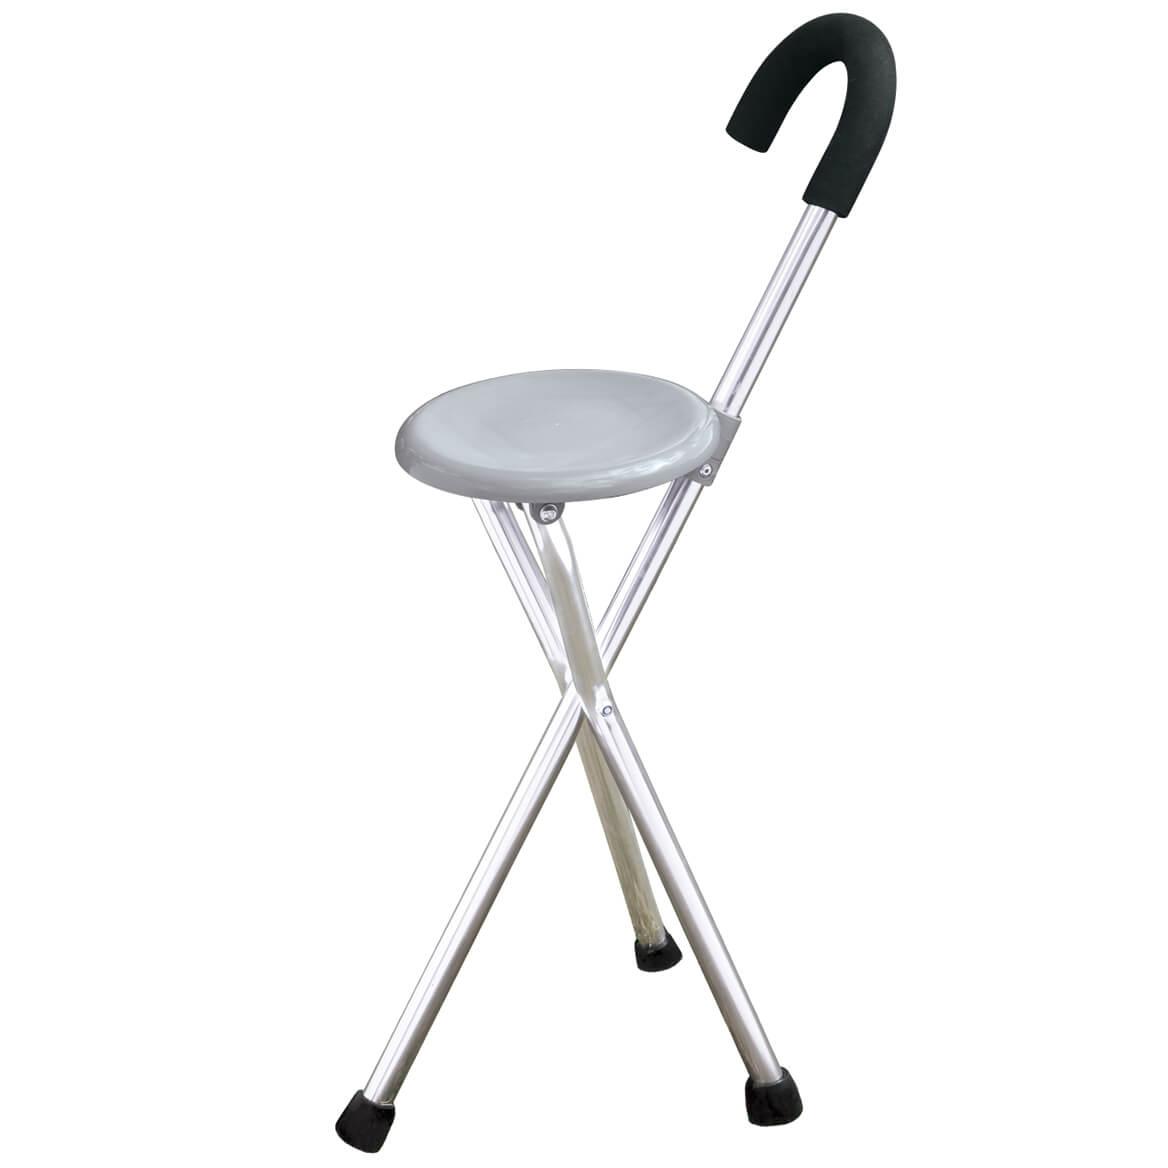 walking cane chair for toddler girl handy seat xl walmart com